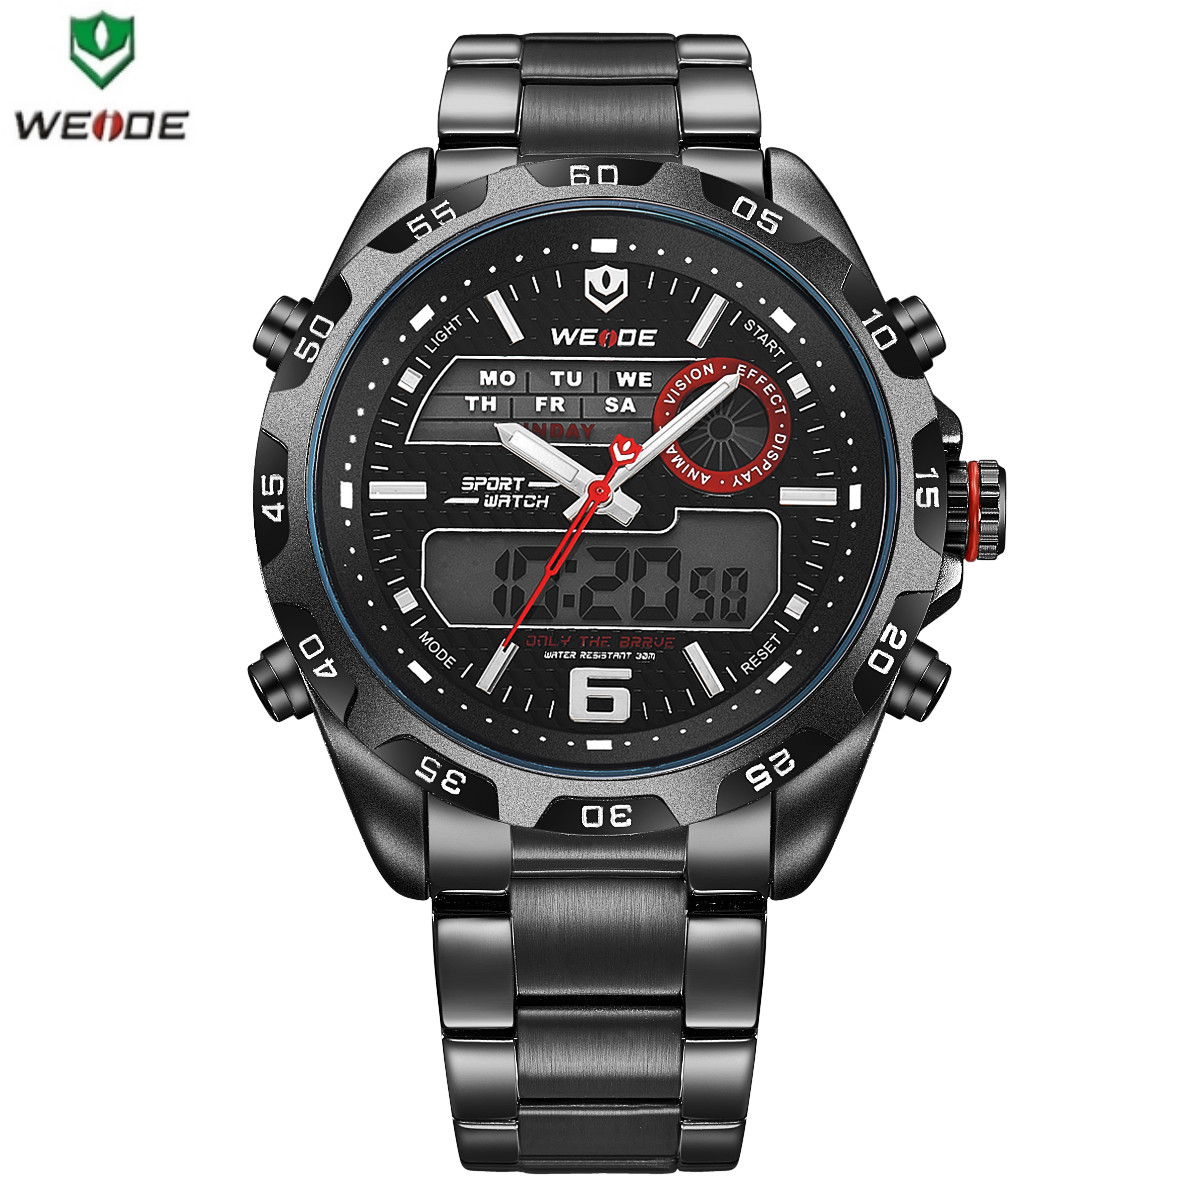 Мужские спортивные часы Weide WH-3403 black